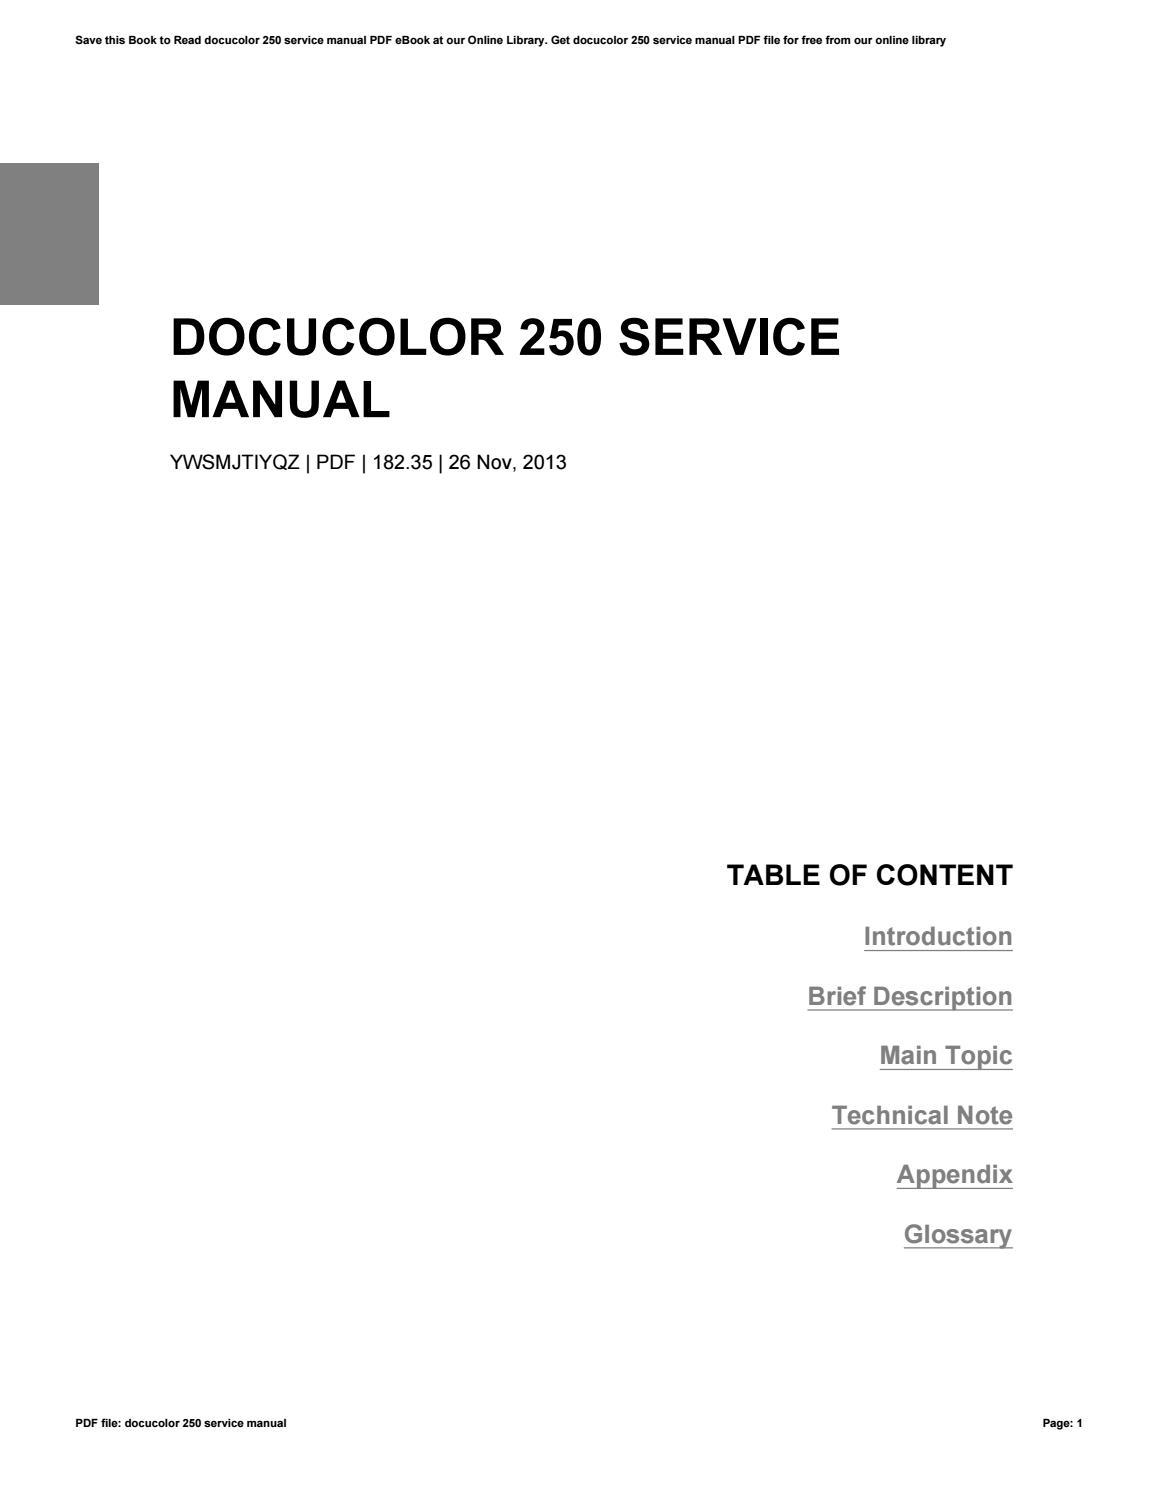 docucolor 250 service manual by e862 issuu rh issuu com docucolor 250 service manual pdf Repair Manuals